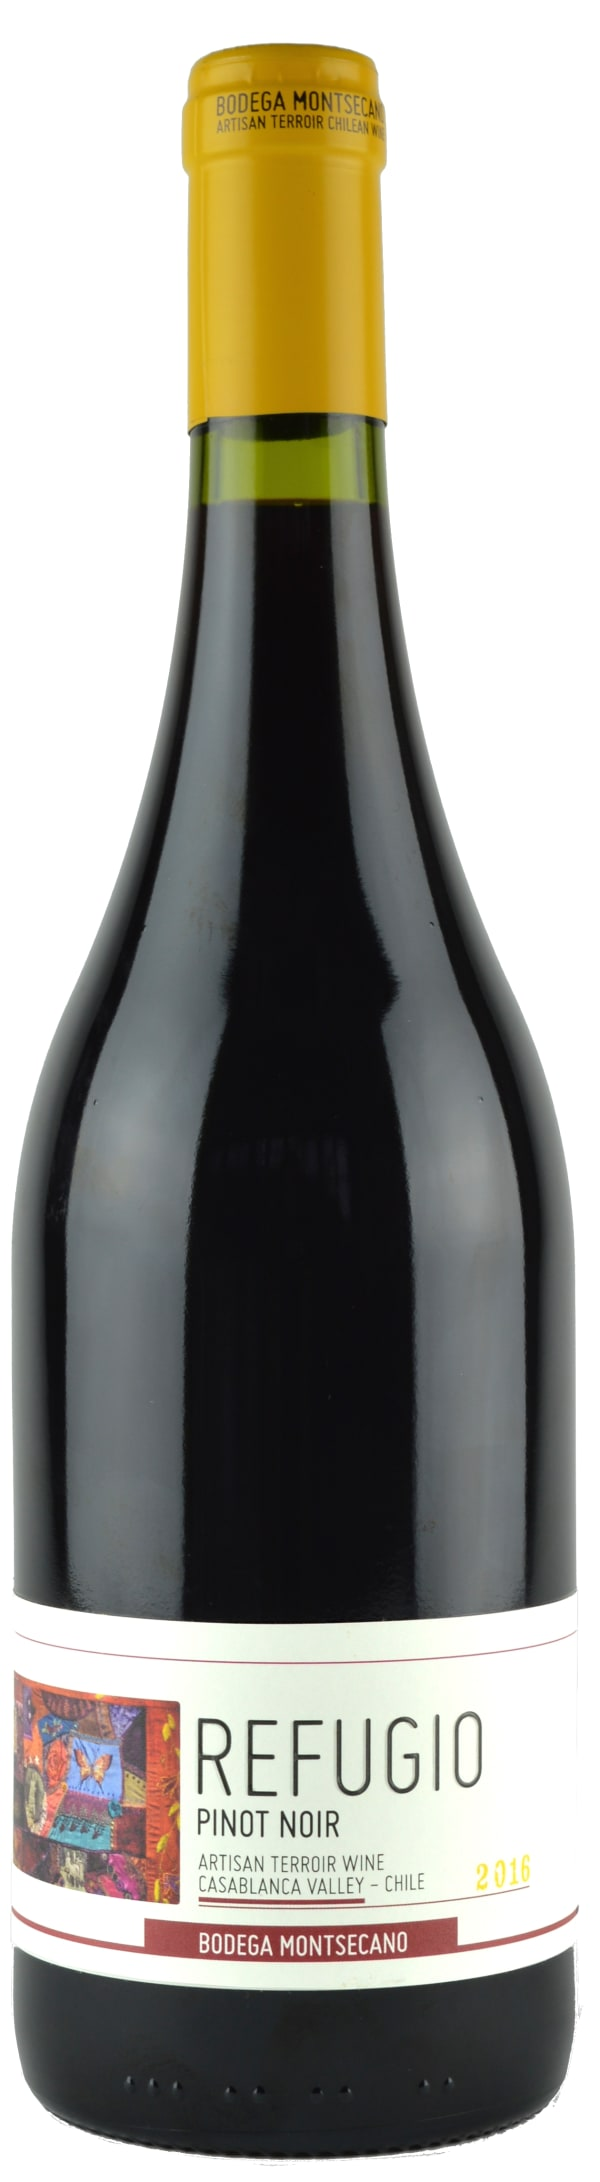 Montsecano Refugio Pinot Noir 2016